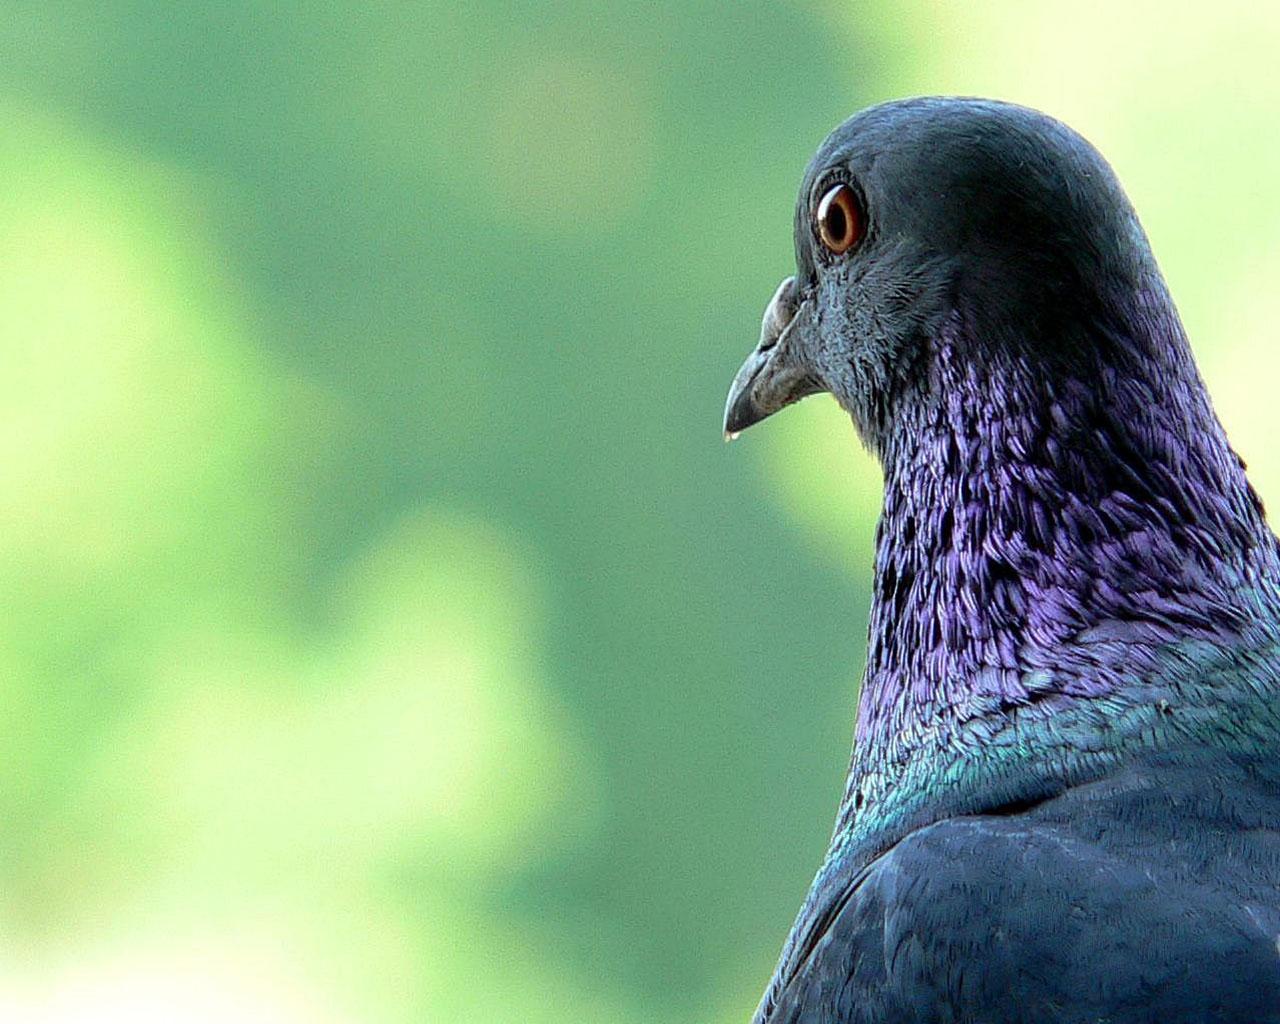 Обои голуби на рабочий стол